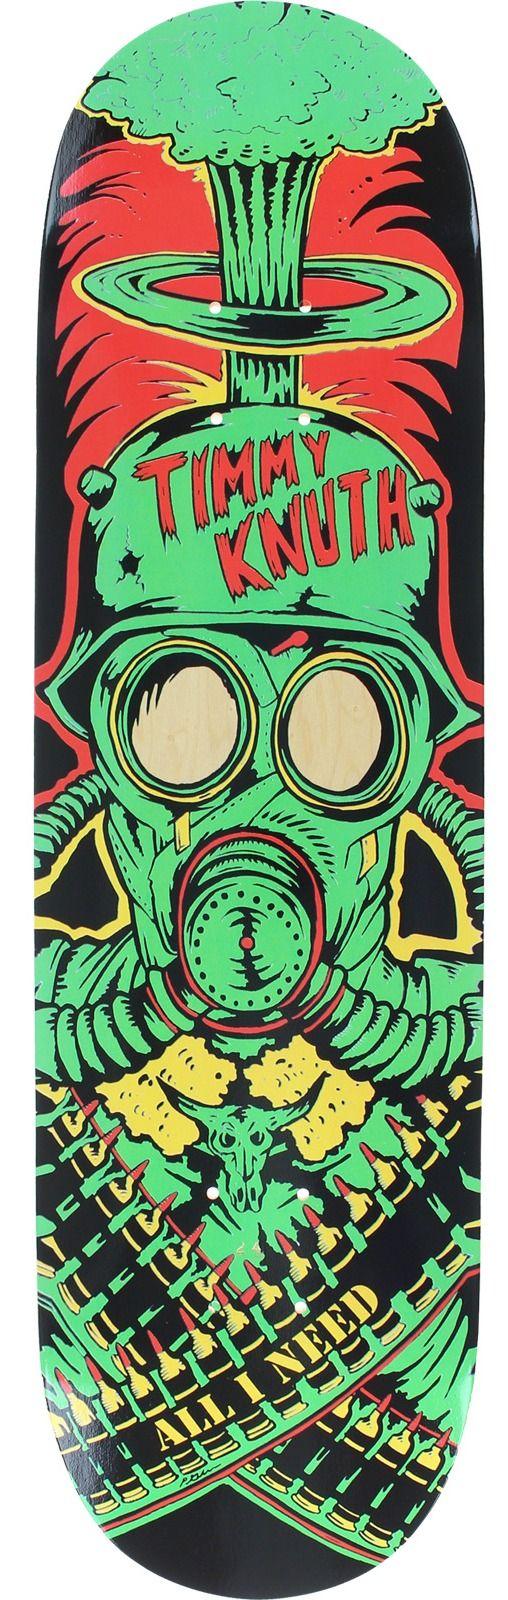 All I Need Skateboards Timmy Knuth War Machine Skateboard Deck